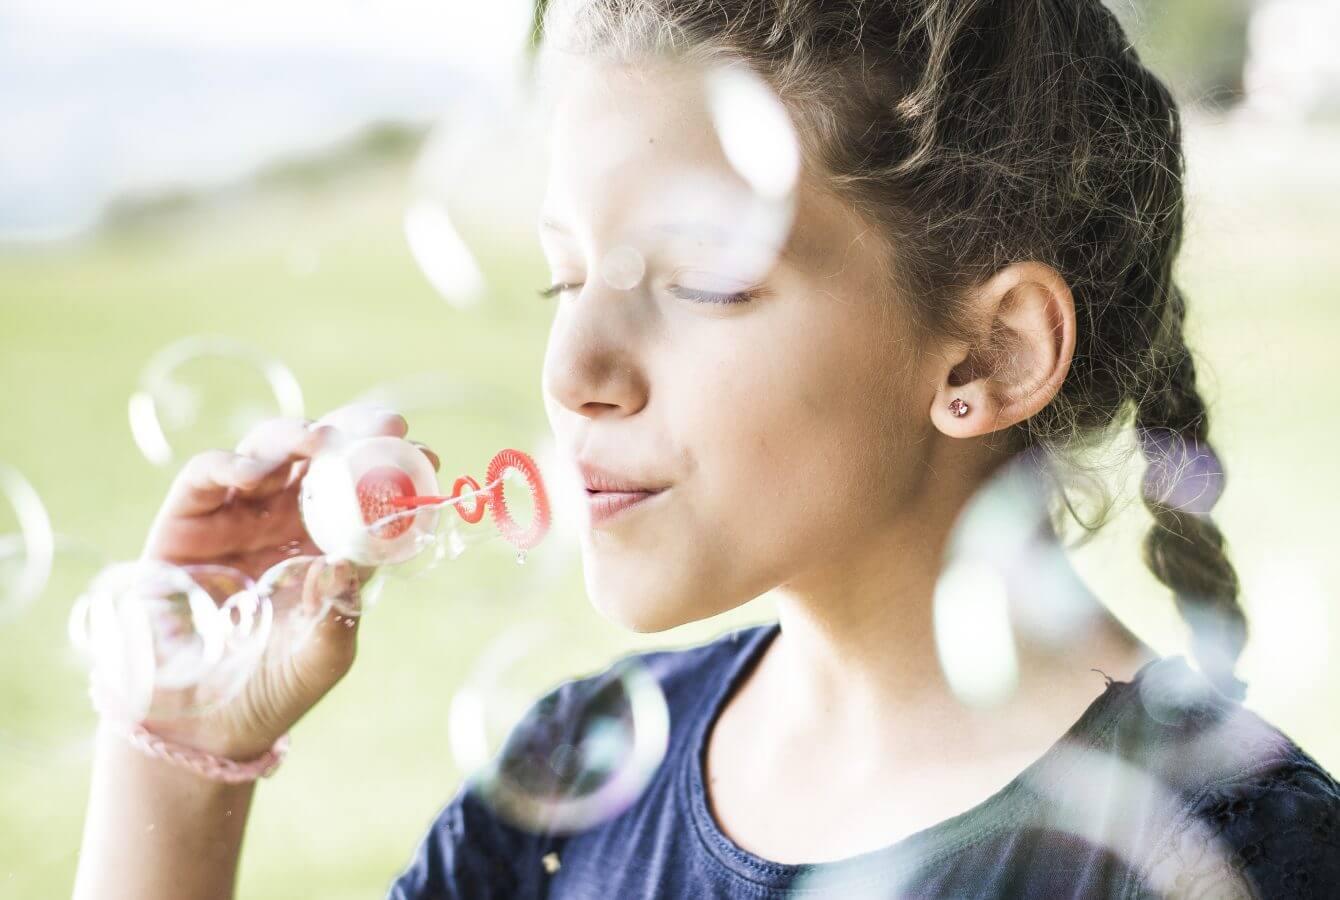 Seifenblasen, Kinder, Familie